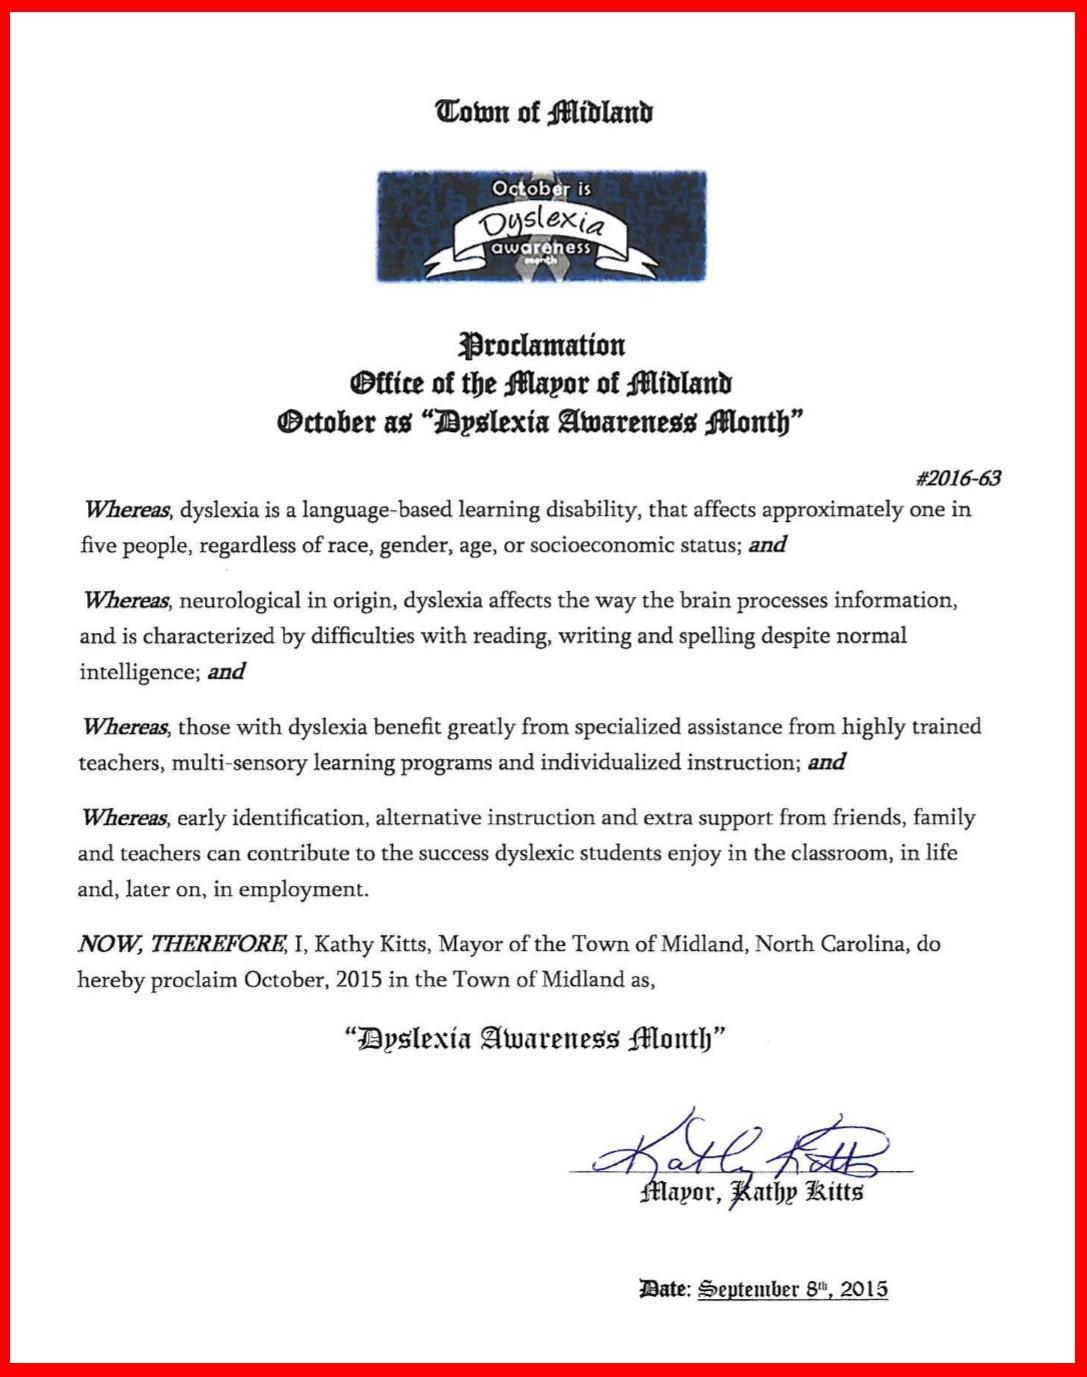 Midland Proclamation